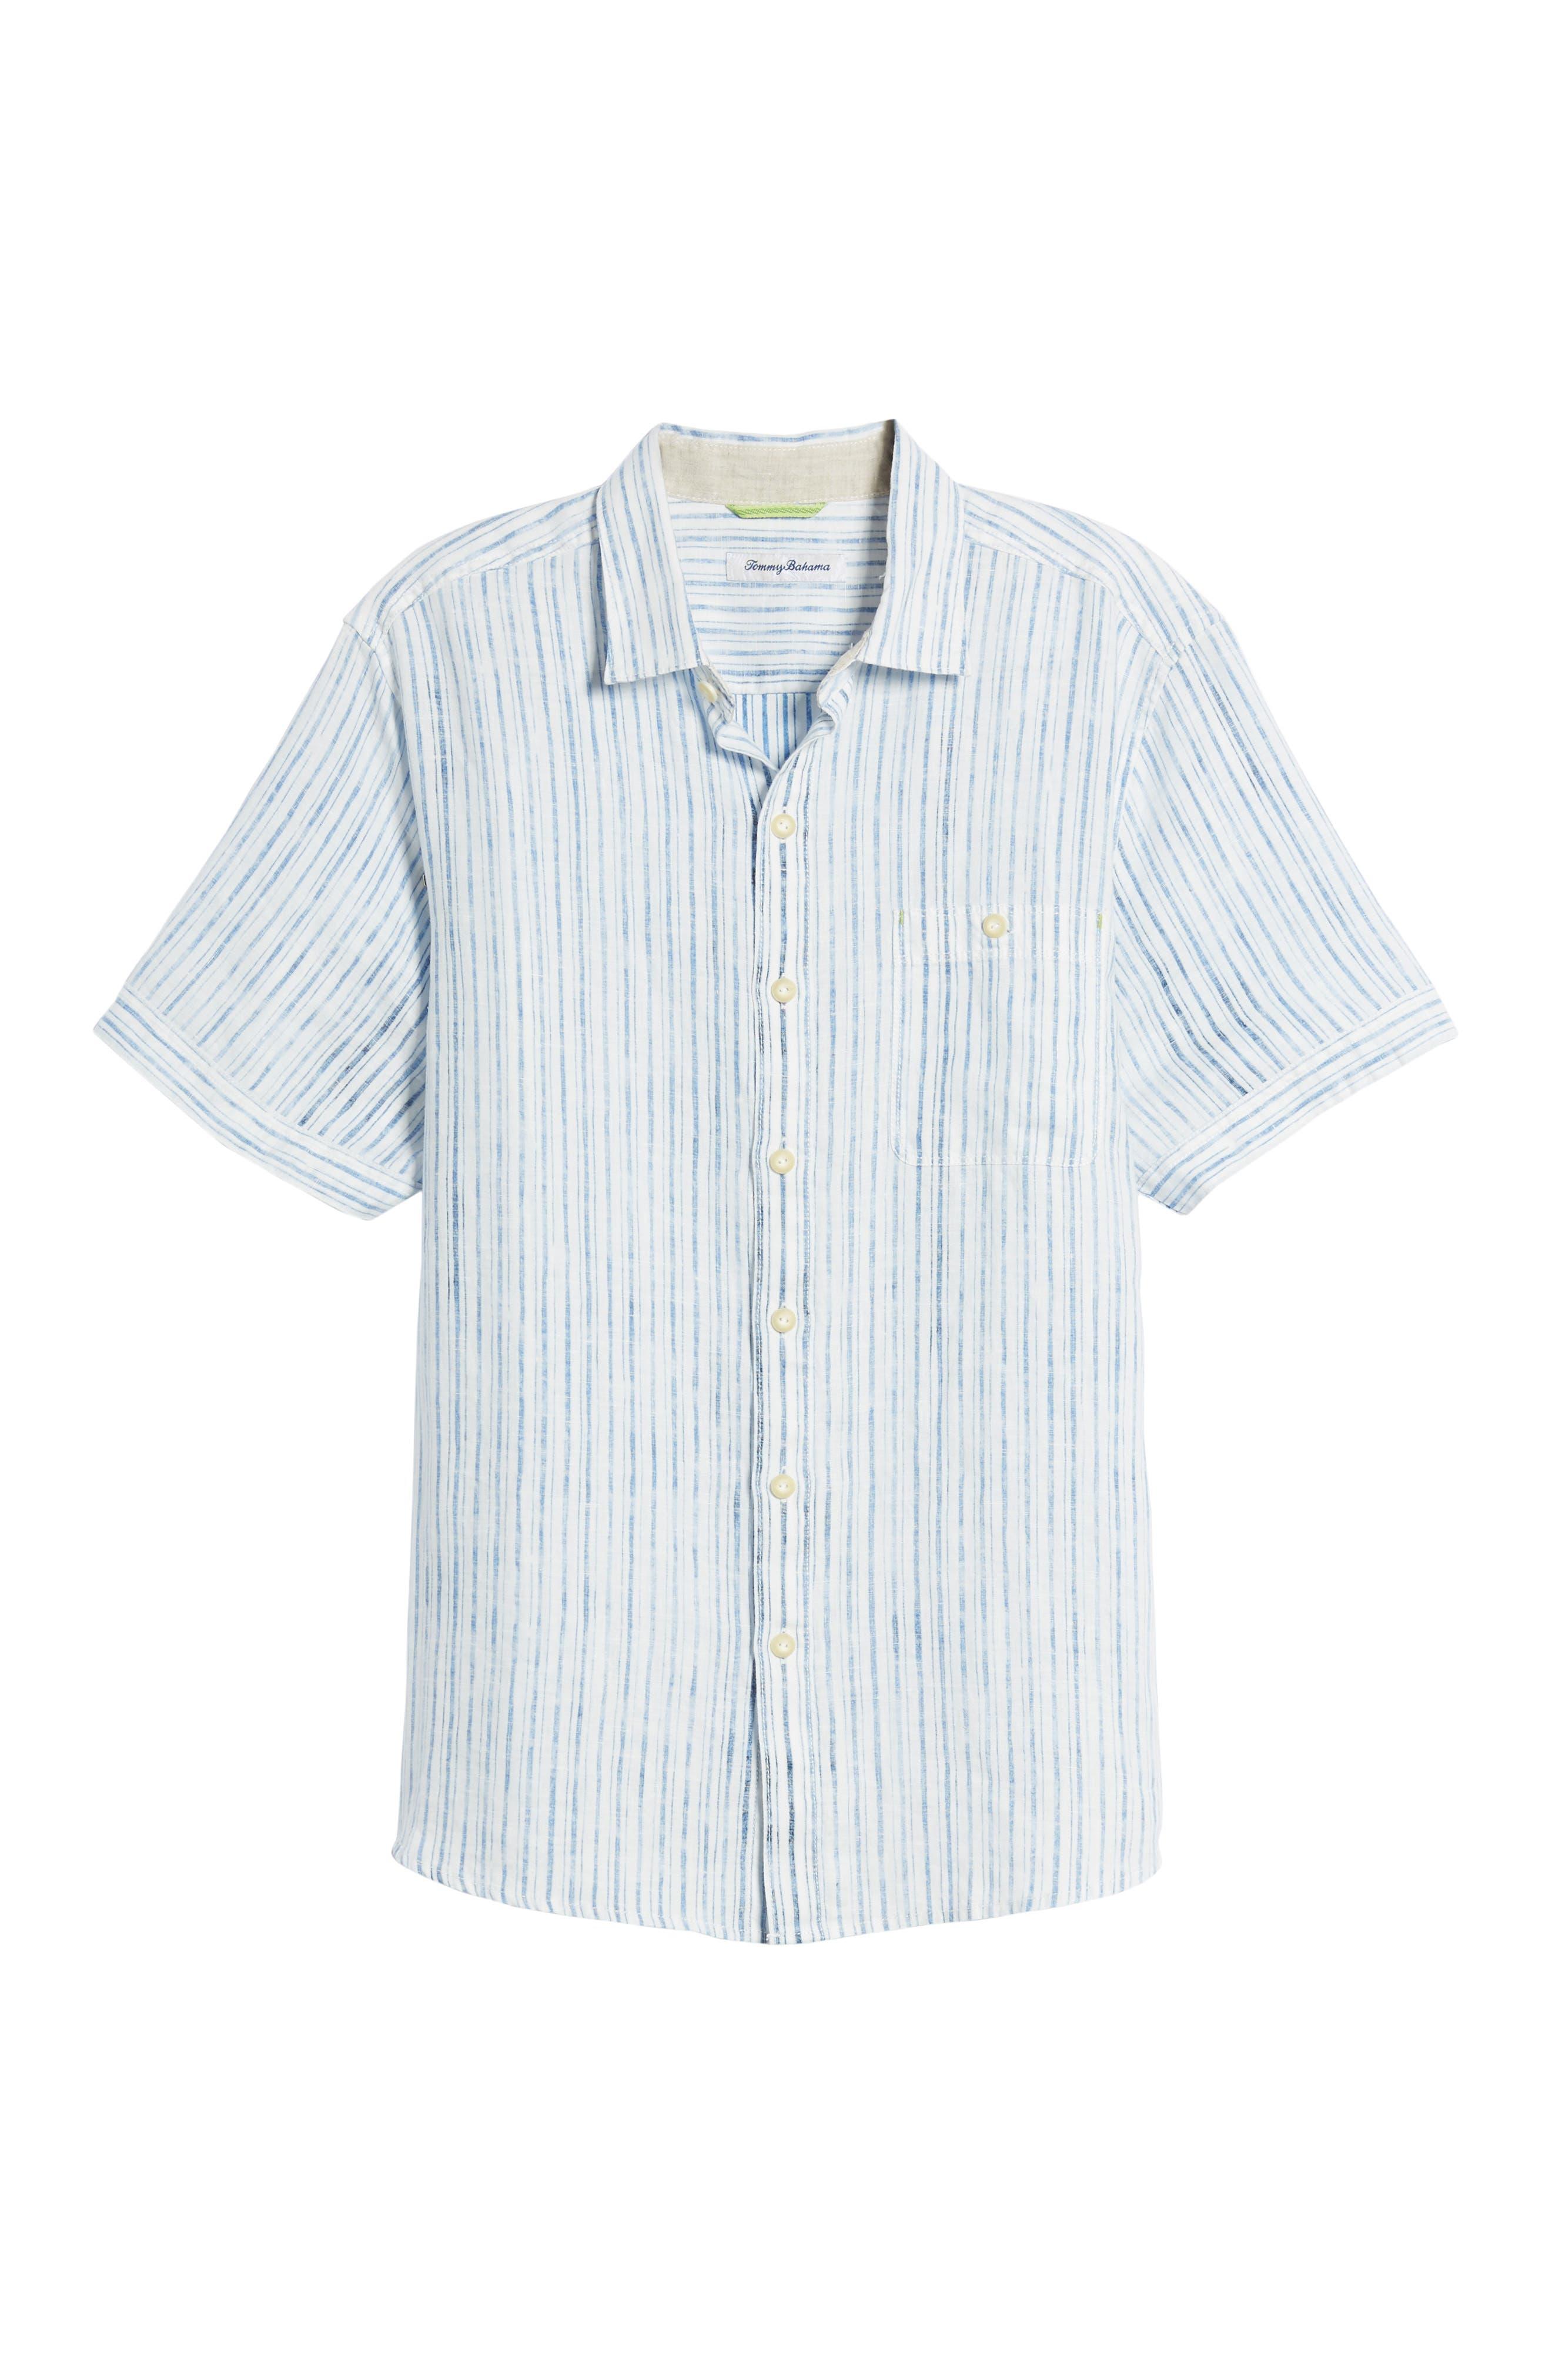 Del Soul Stripe Linen Sport Shirt,                             Alternate thumbnail 6, color,                             BLUE SPARK